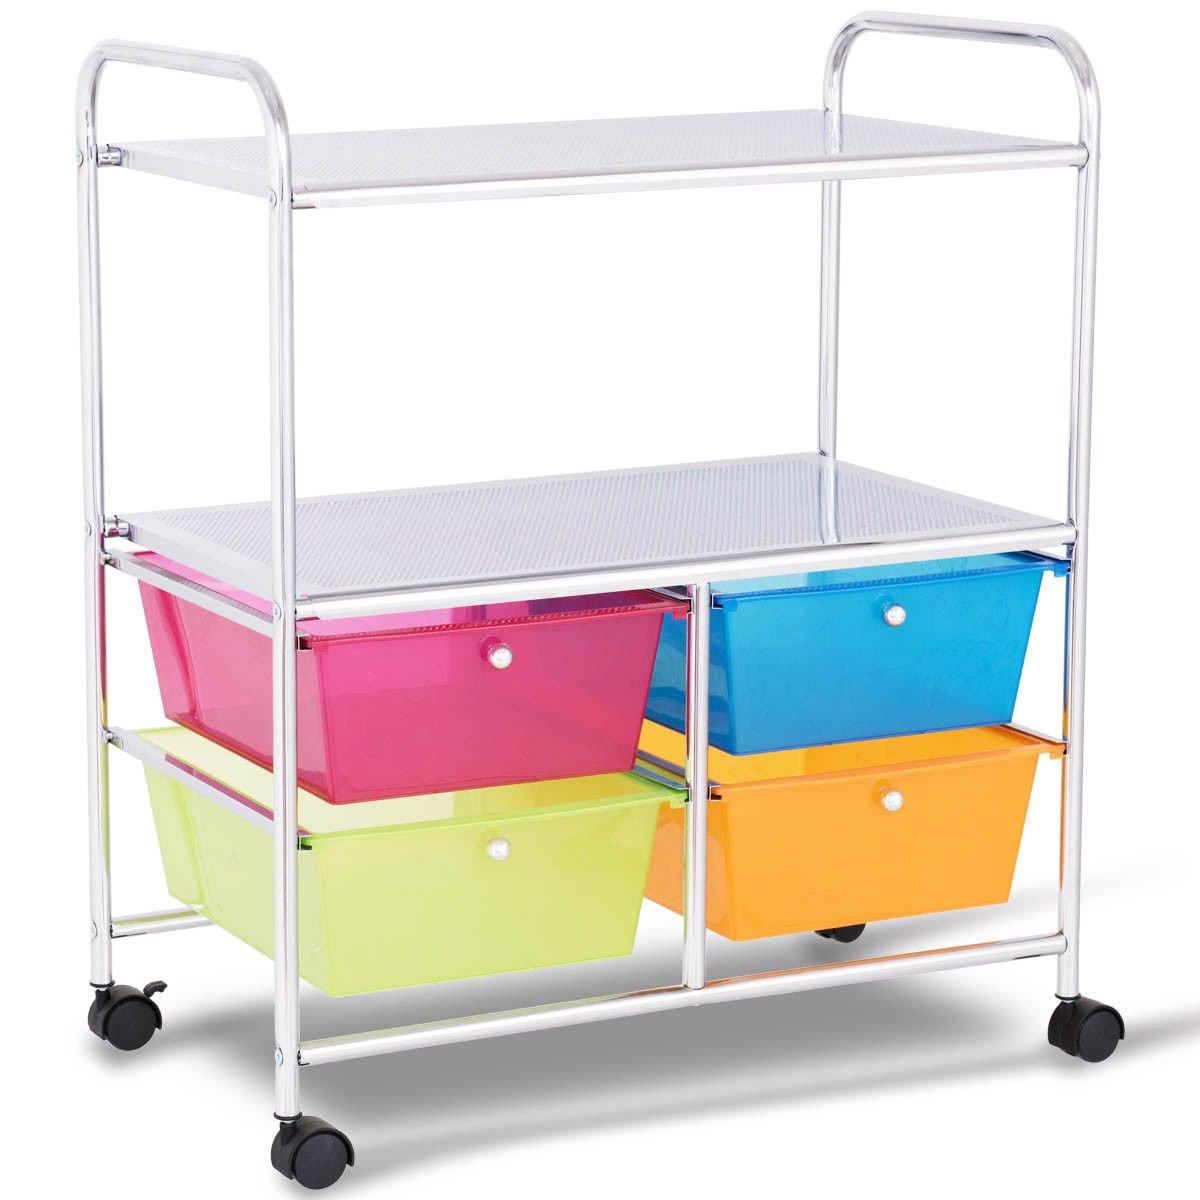 Giantex Rolling Storage Cart w/ 4 Drawers 2 Shelves Metal Rack Shelf Home Office School Beauty Salon Utility Organizer Cart with Wheels (Blue Green Orange & Red) by Giantex (Image #1)